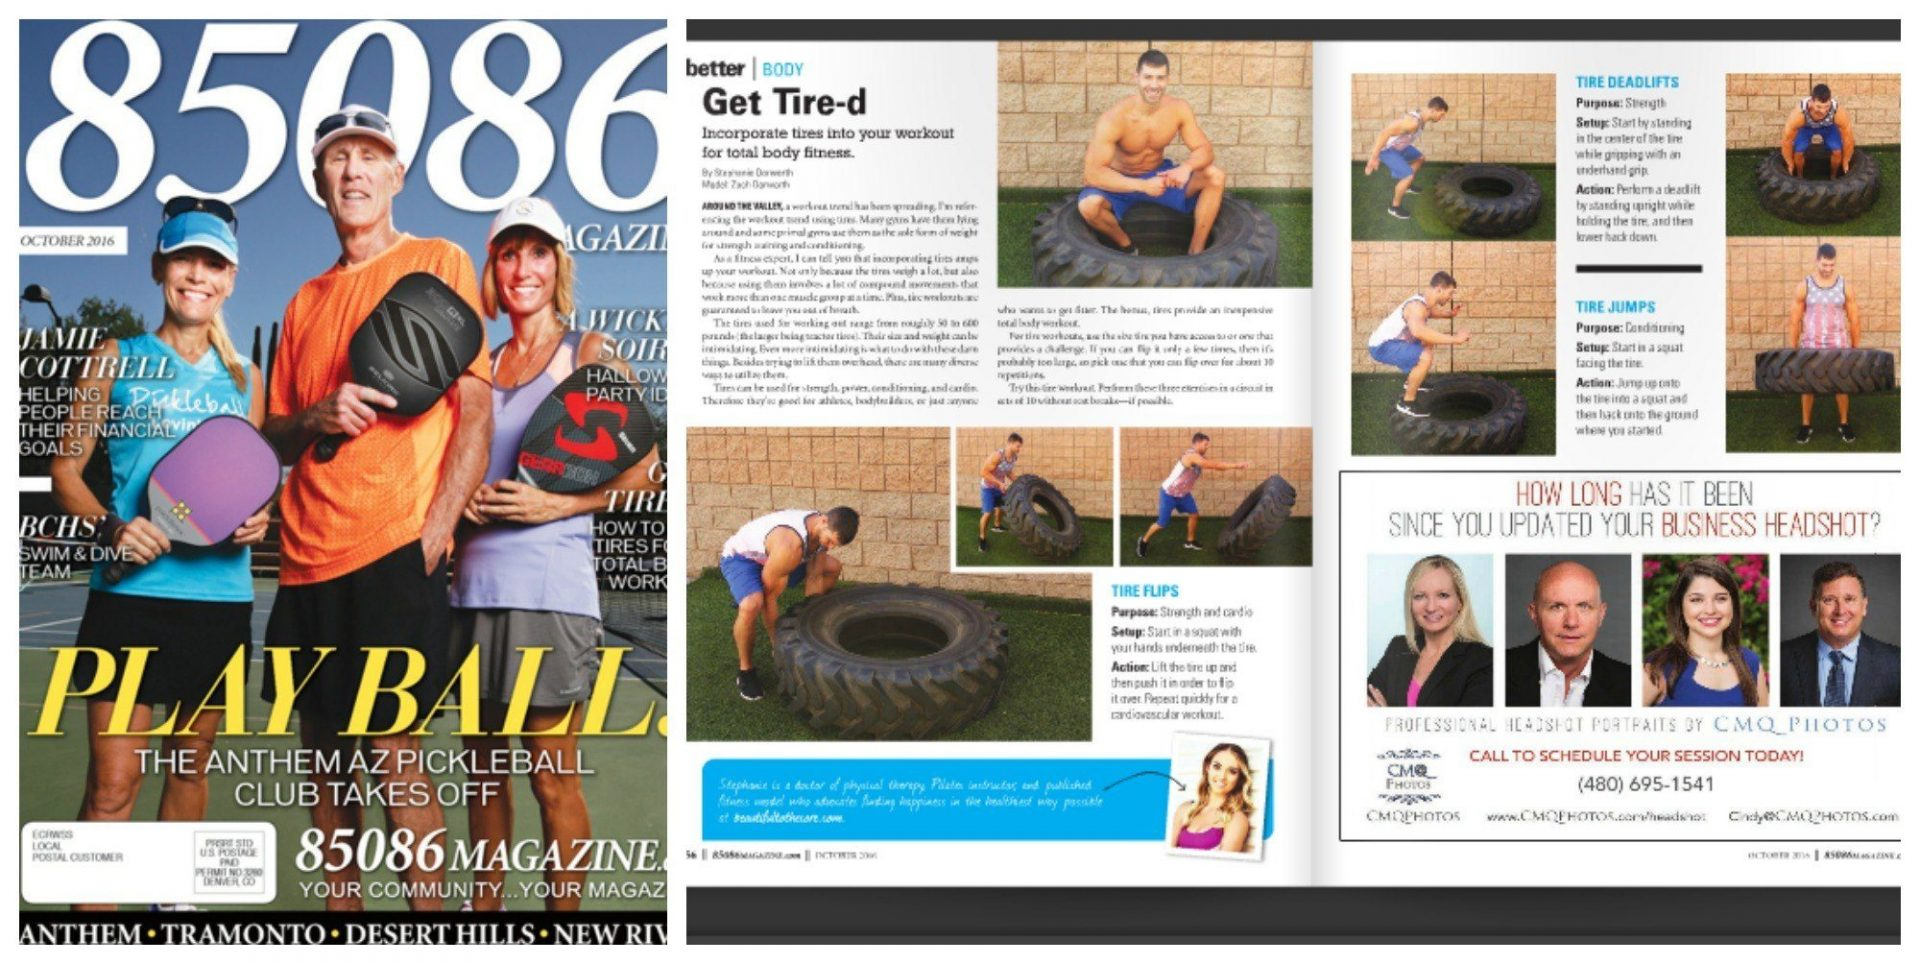 85086 magazine that flex life